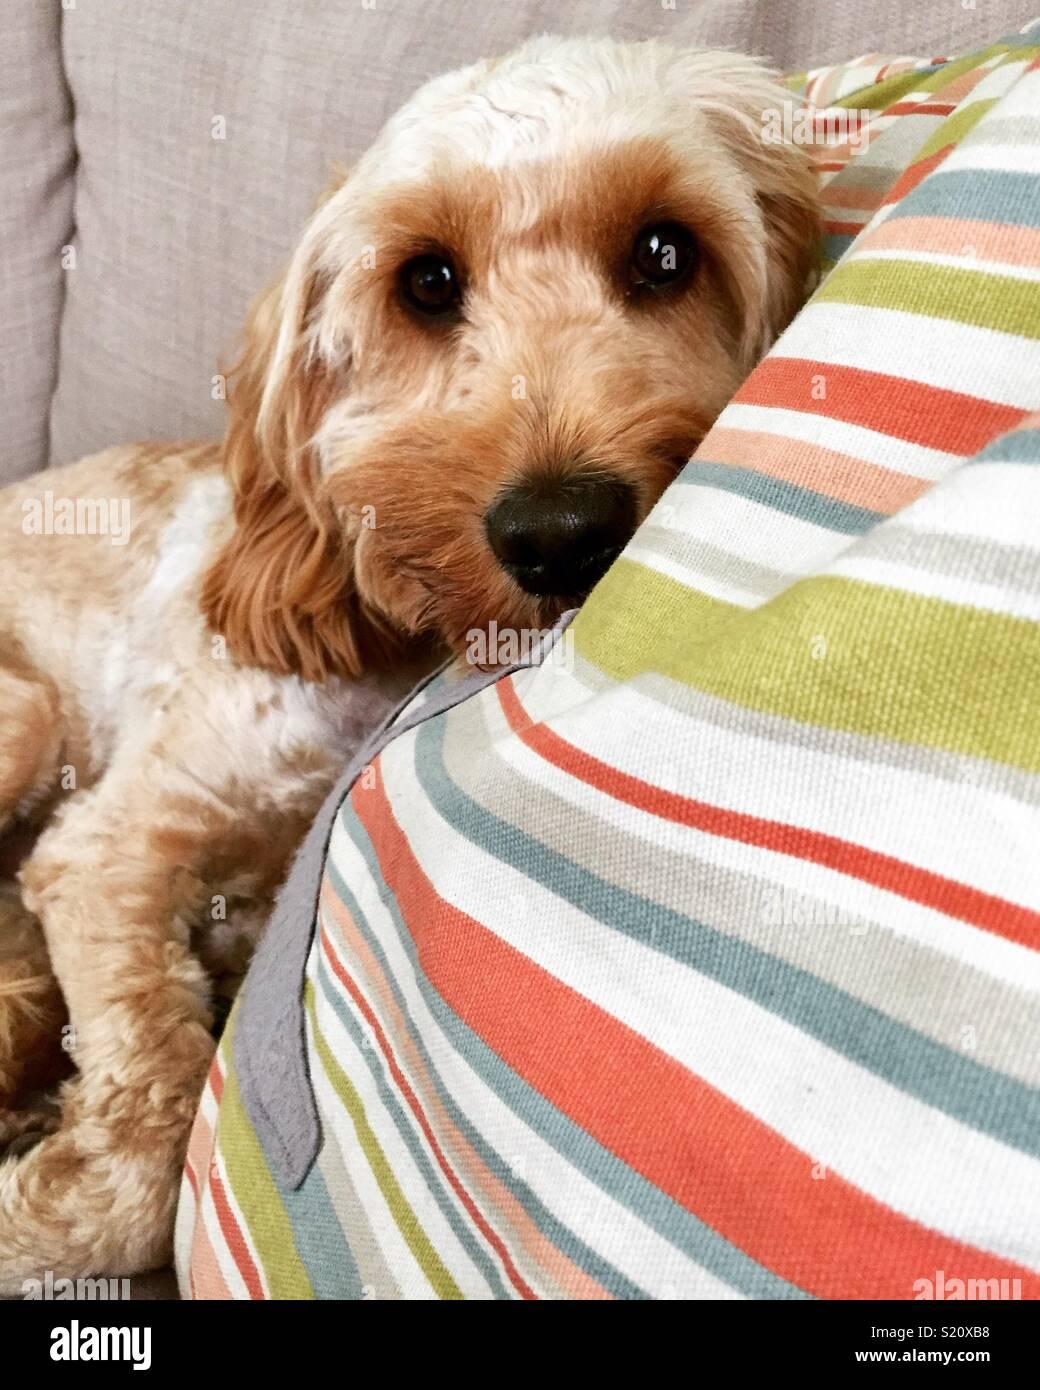 Cockapoo dog - Stock Image